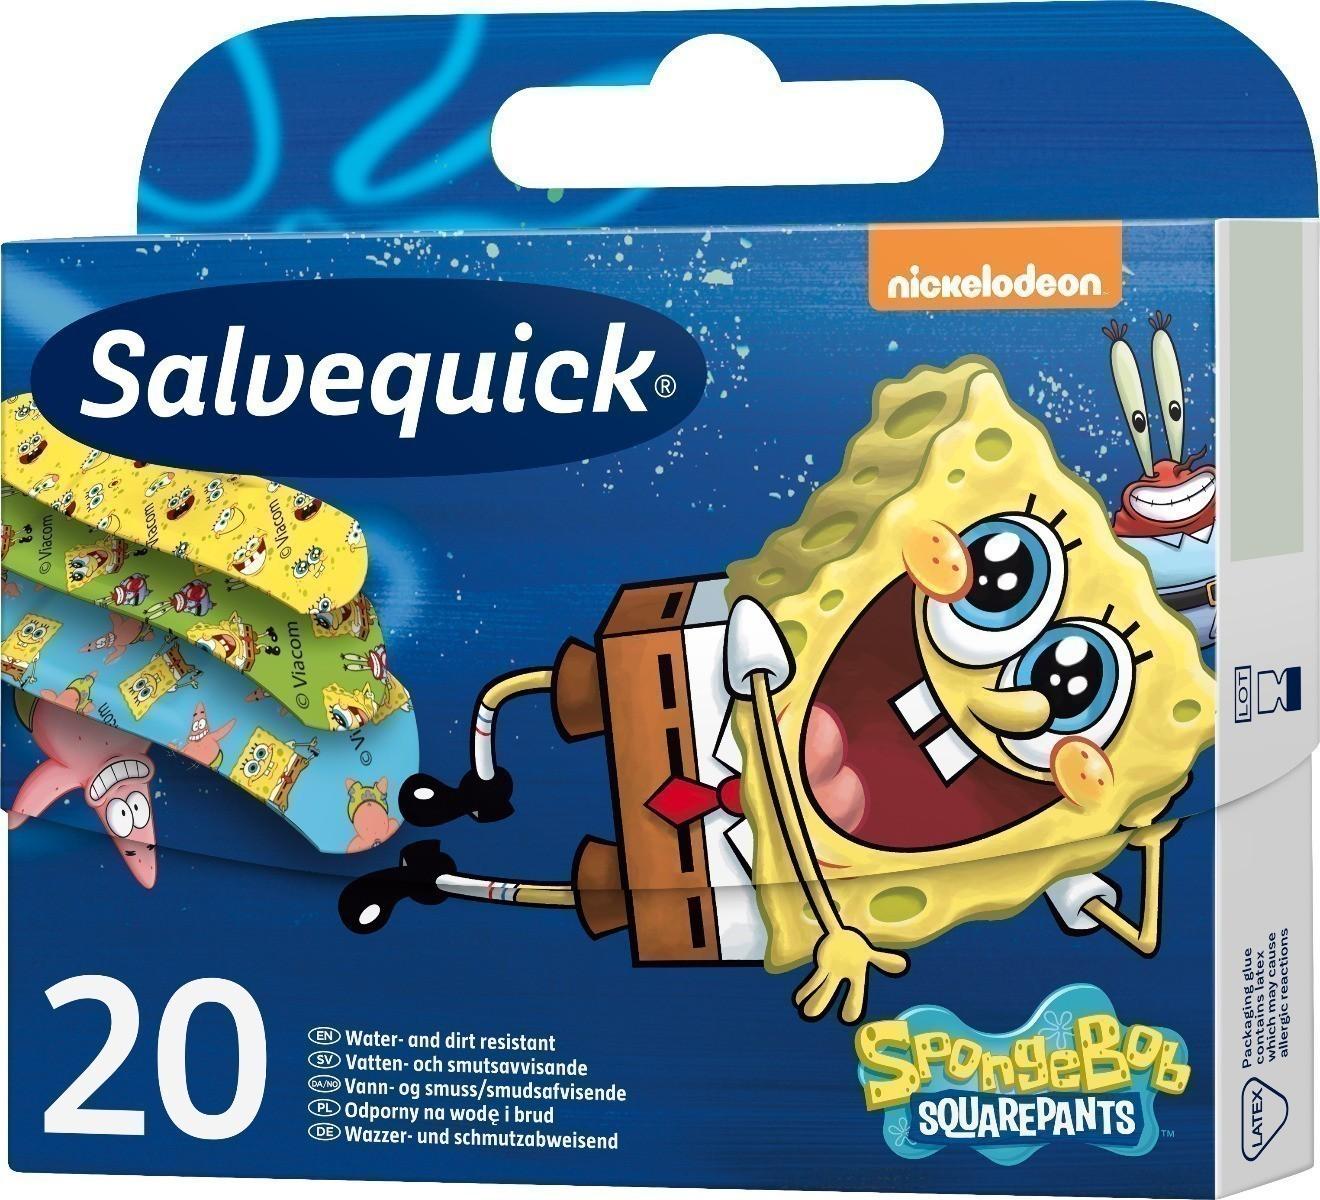 Salvequick Sponge Bob - plastry